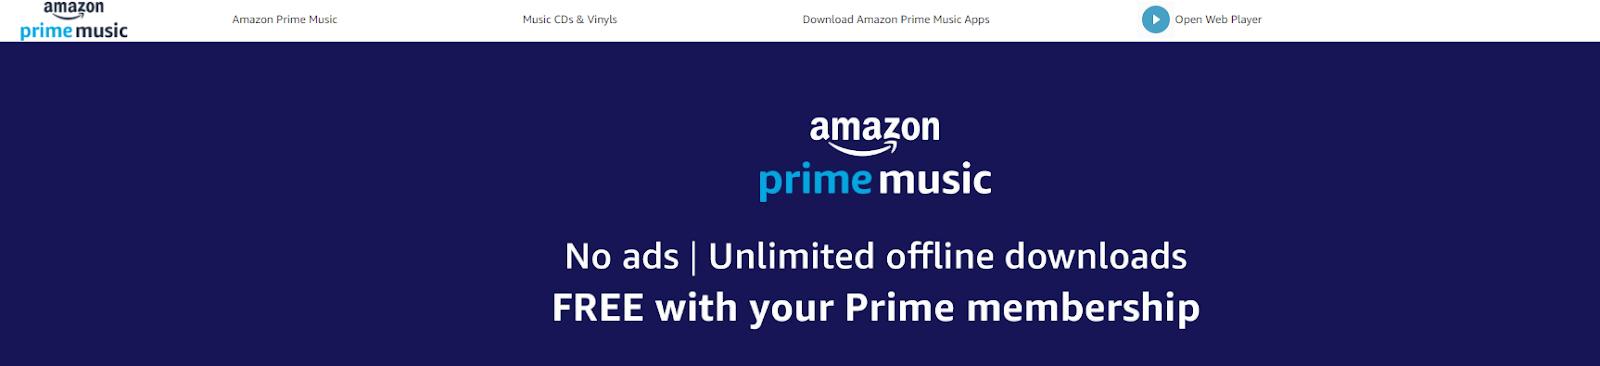 Nhạc Amazon Prime